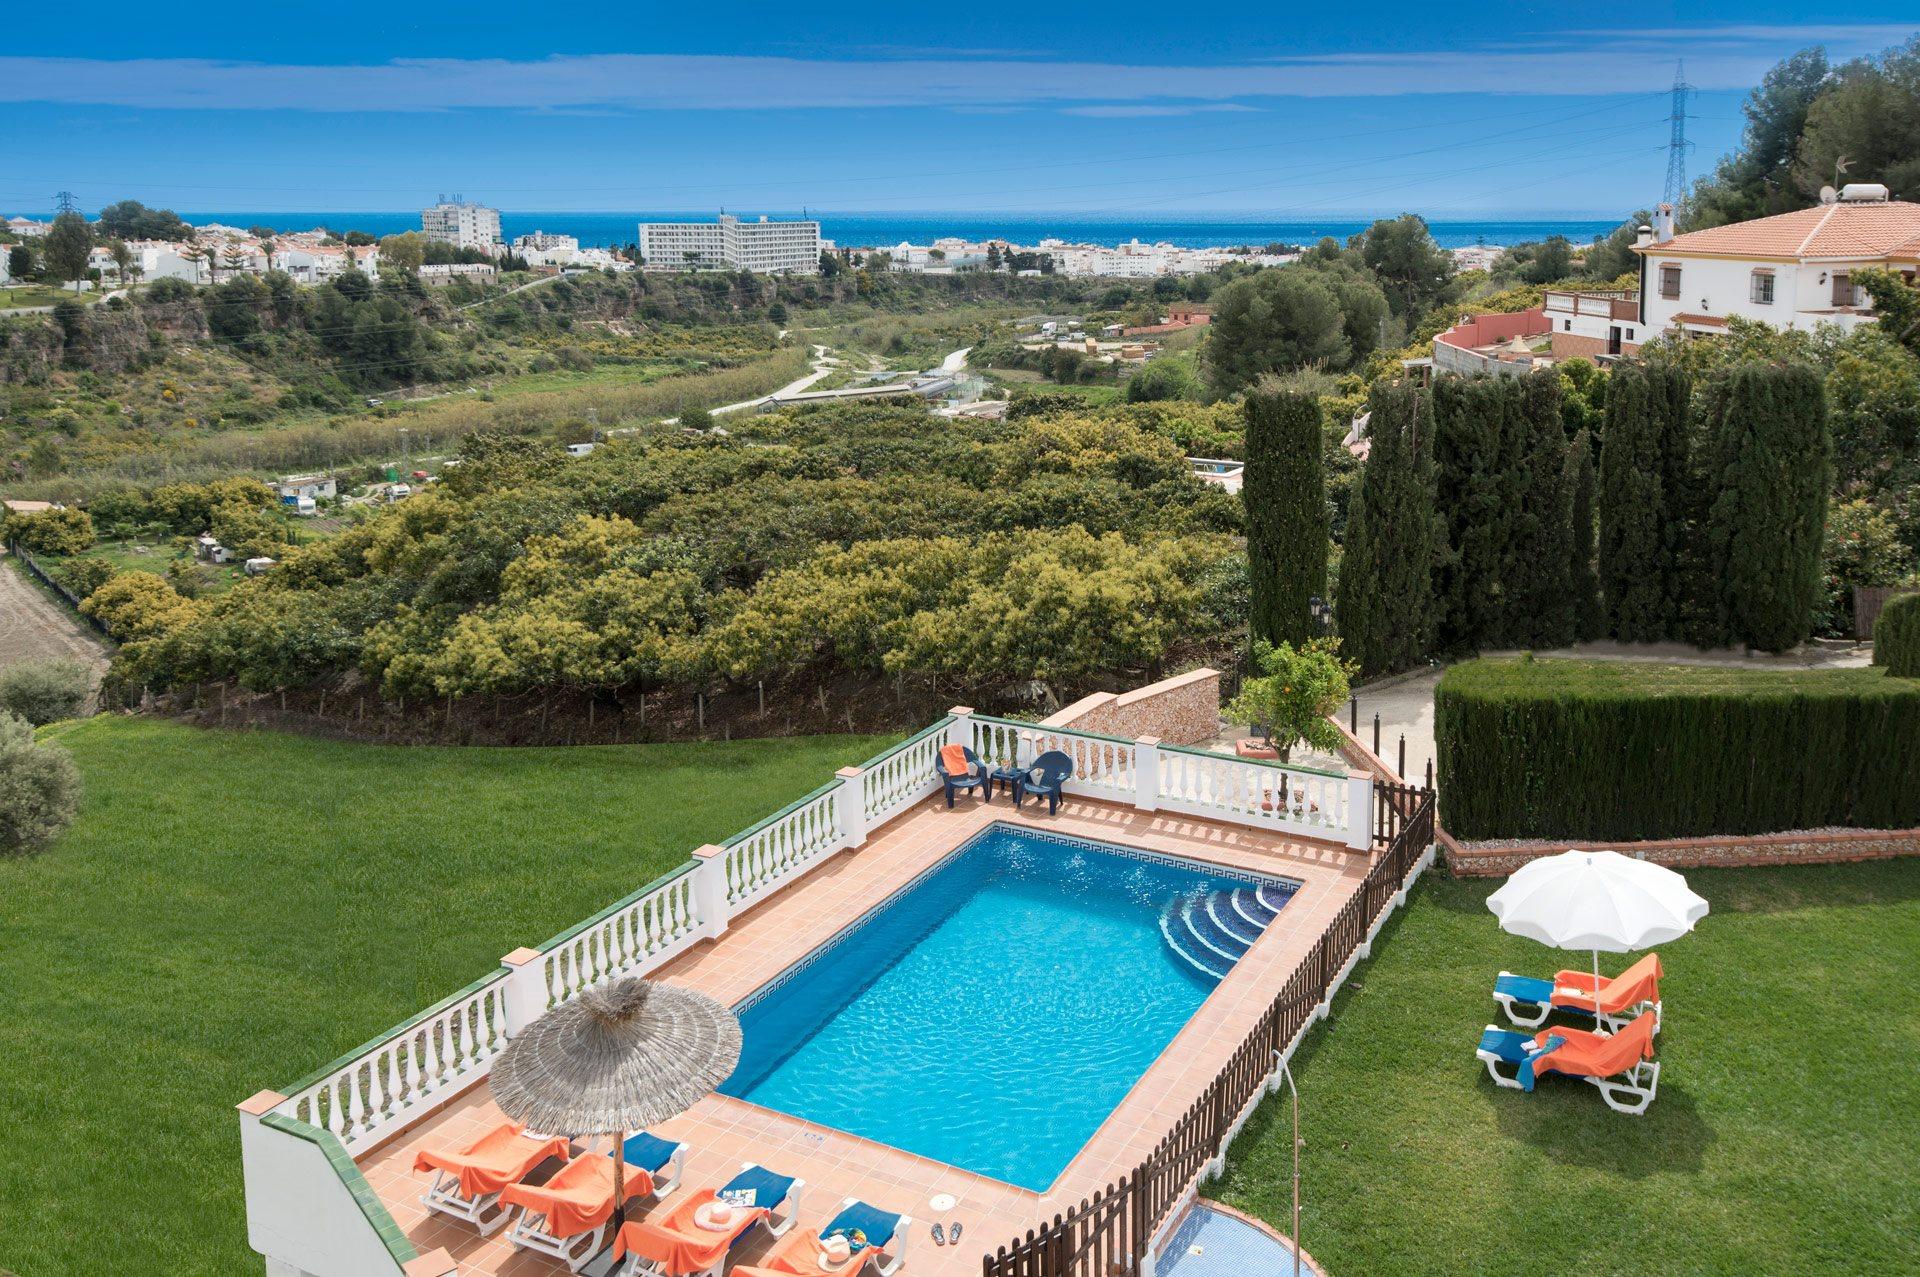 Villa Rosa Minas, Nerja, Andalucia, Spain